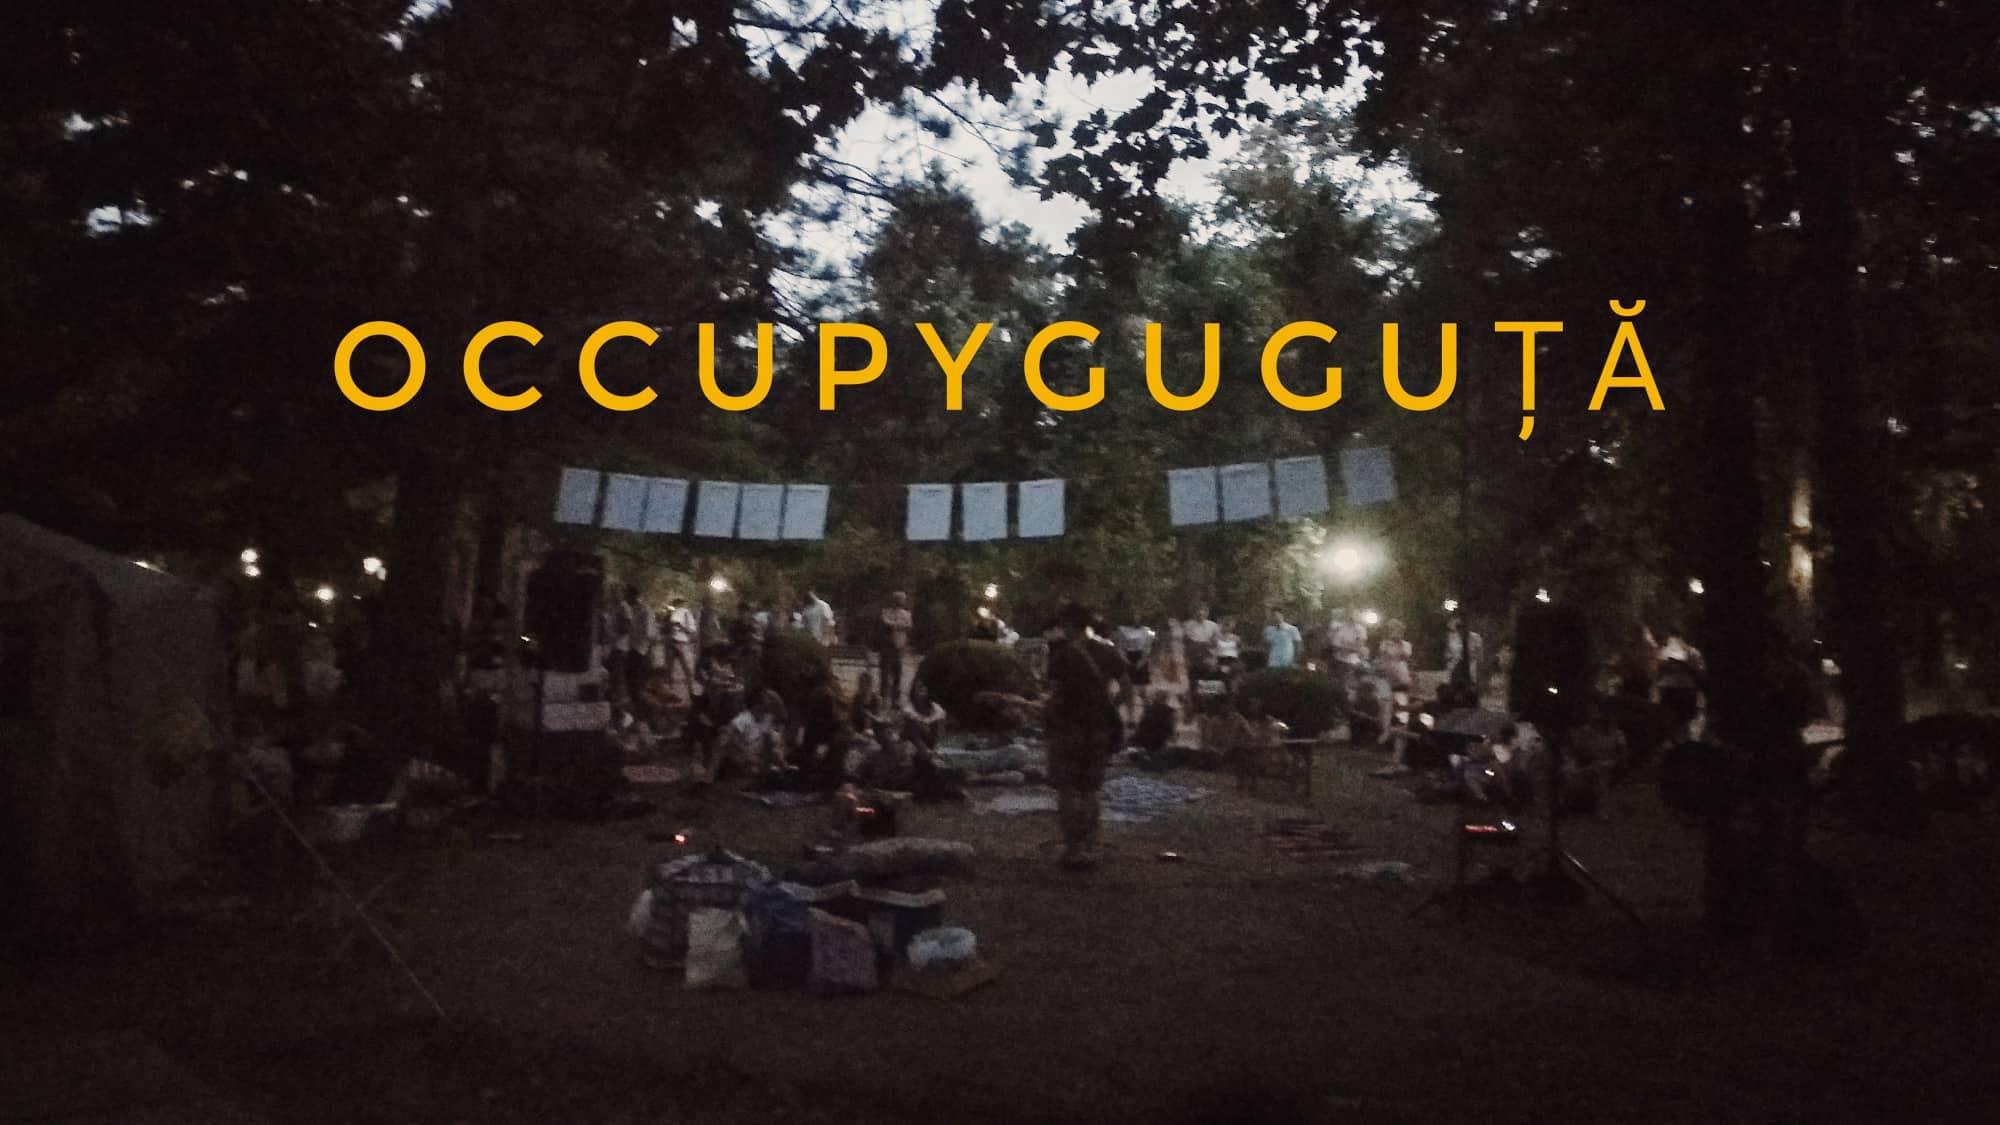 Occupy Guguță